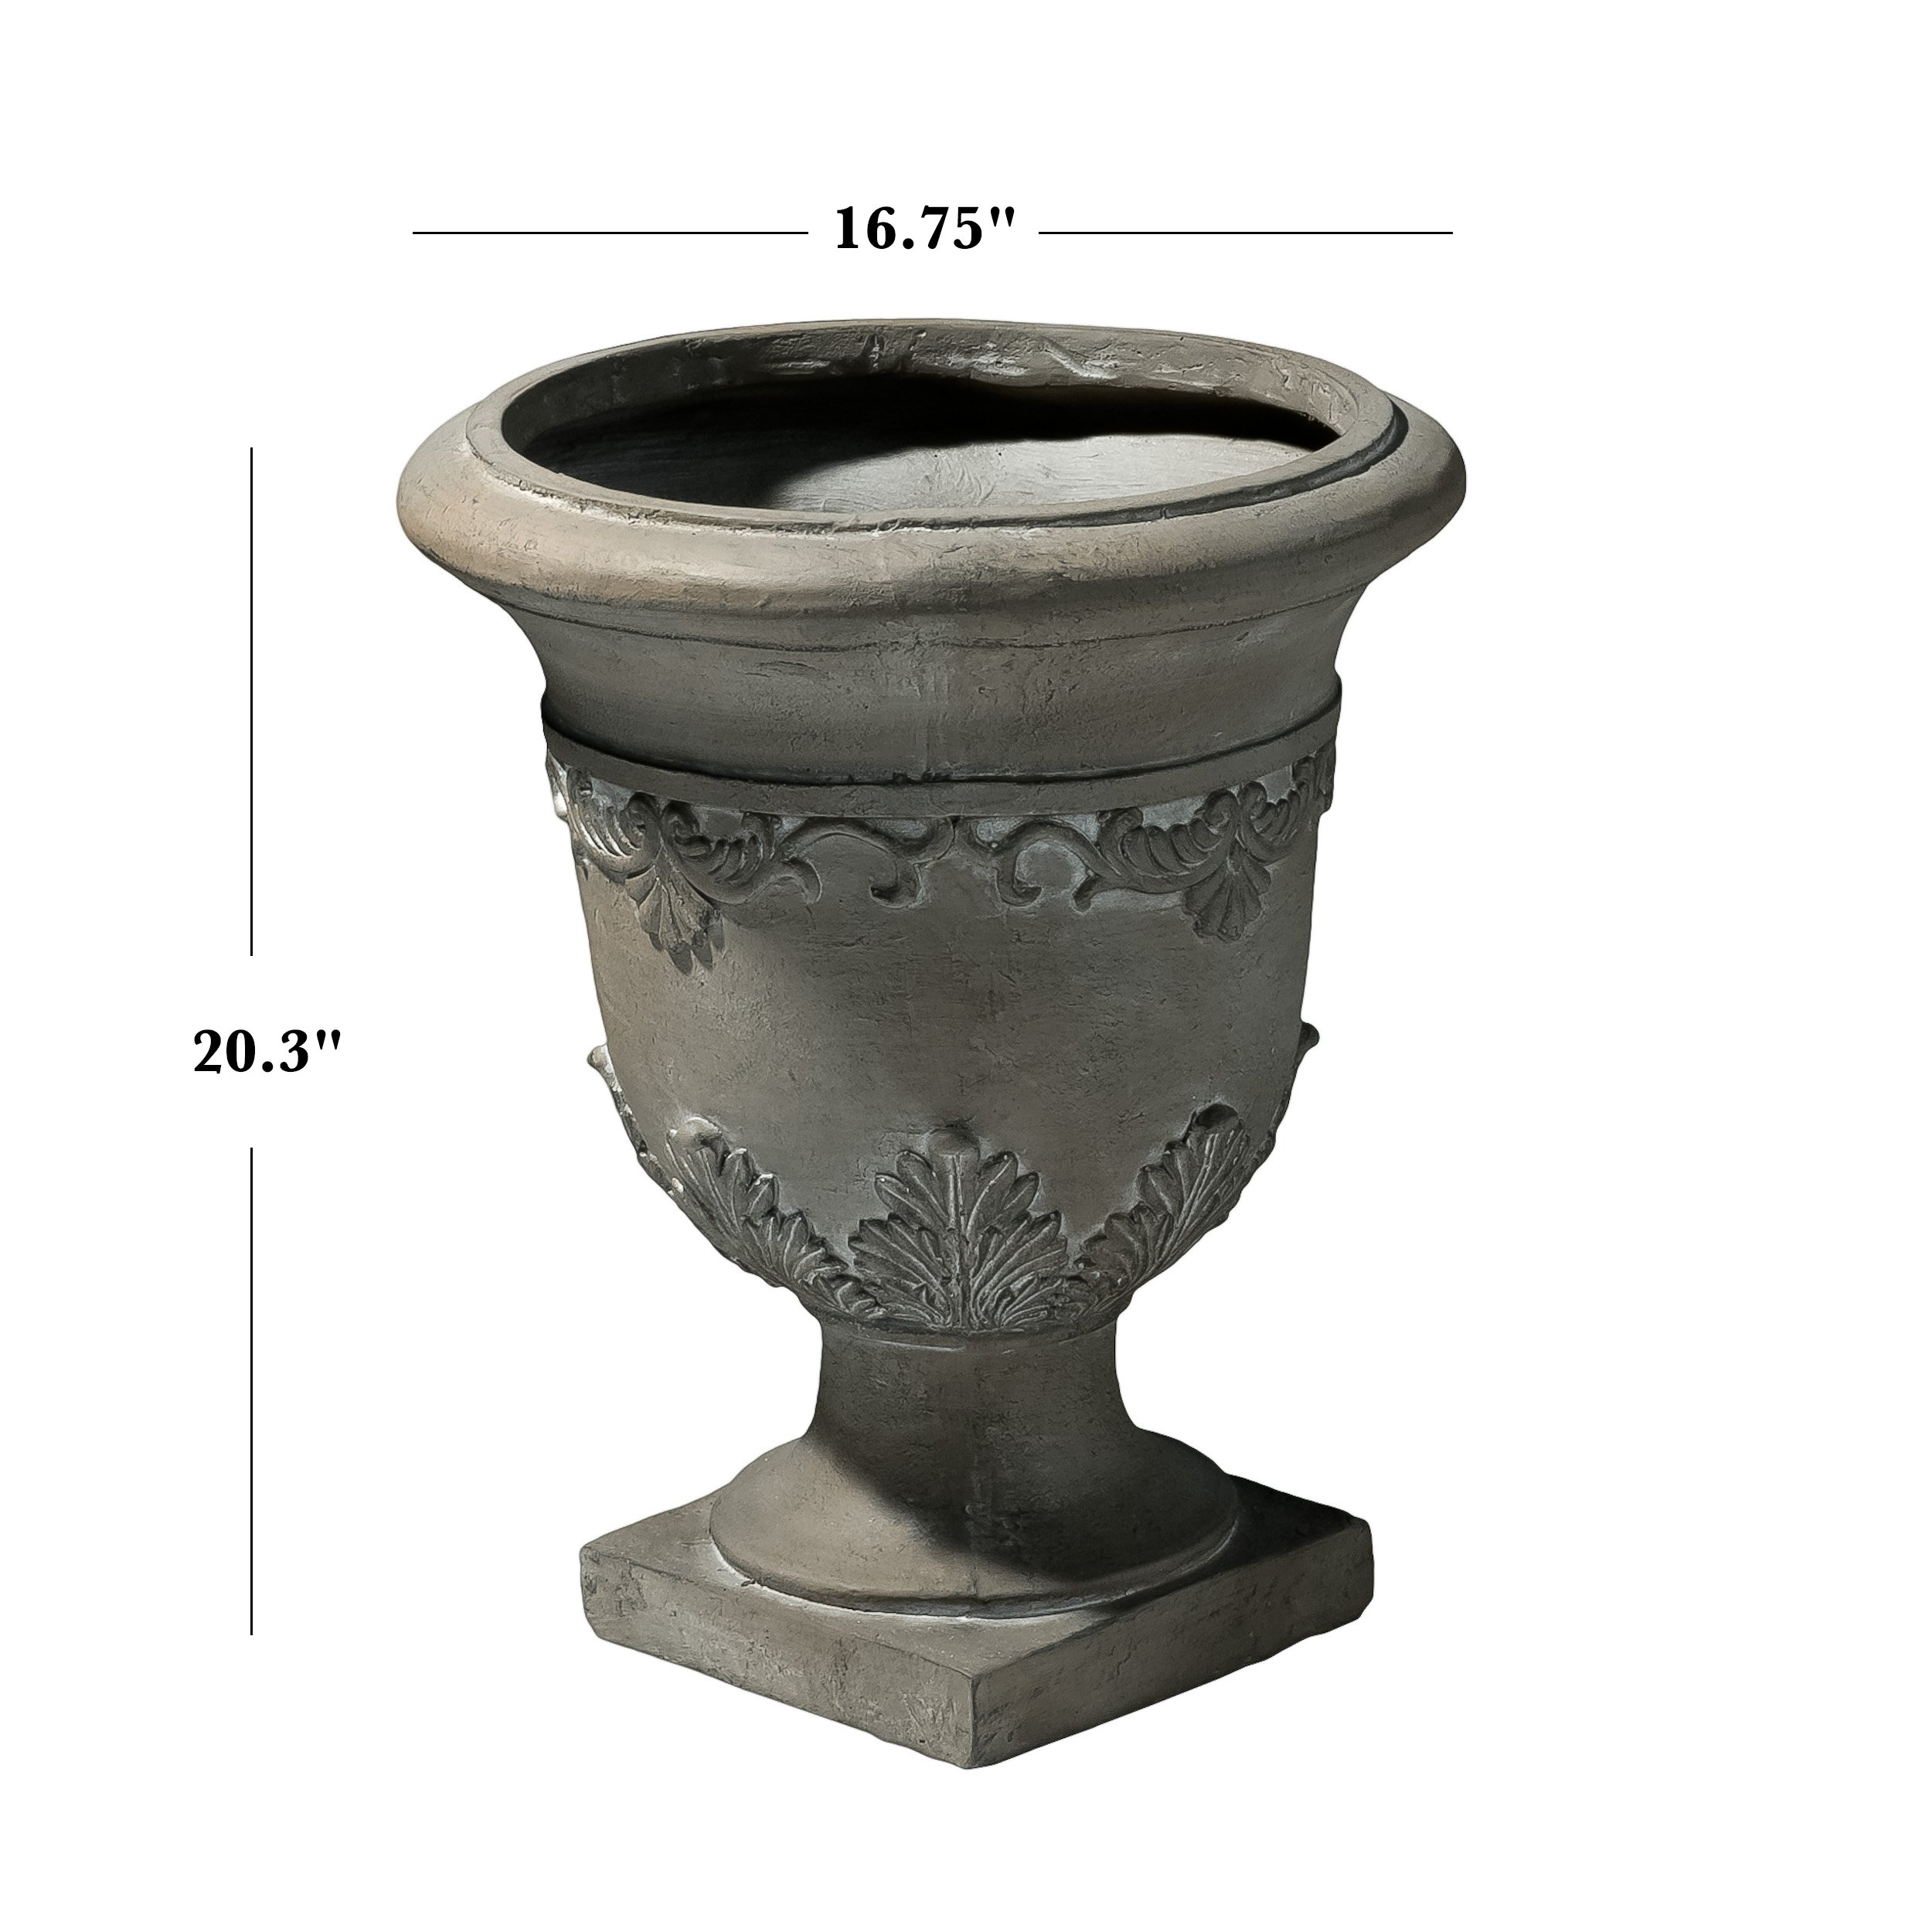 Christopher Knight Home Antonio Antique Moroccan 20-inch Urn Planter by Christopher Knight Home (Image #2)